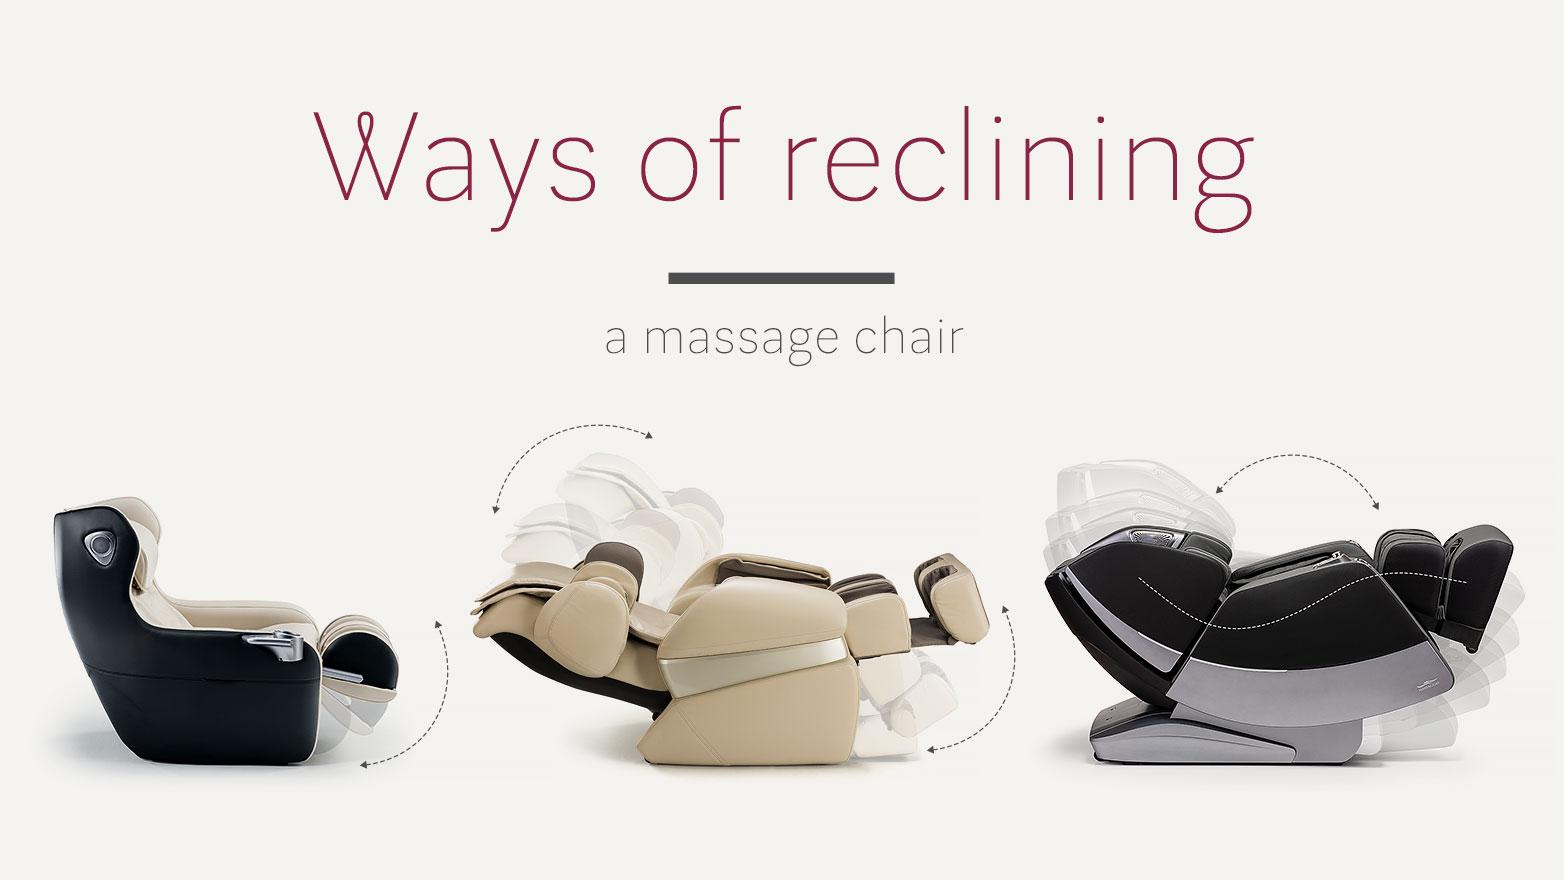 Ways of reclining massage chair